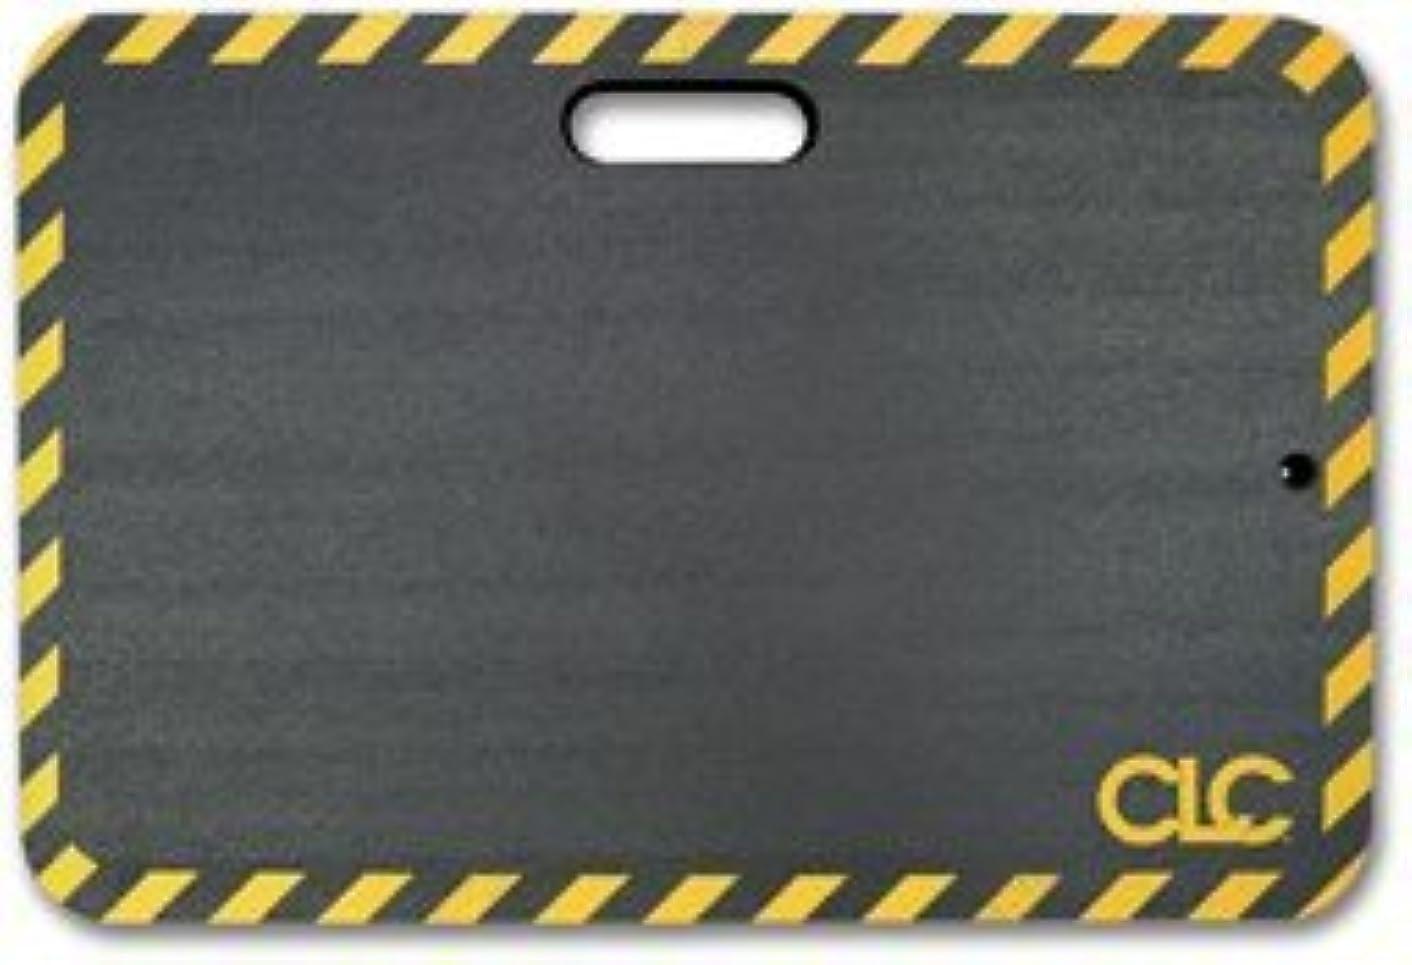 CLC Kneeling Pad, 16 x 28in, Black, NBR